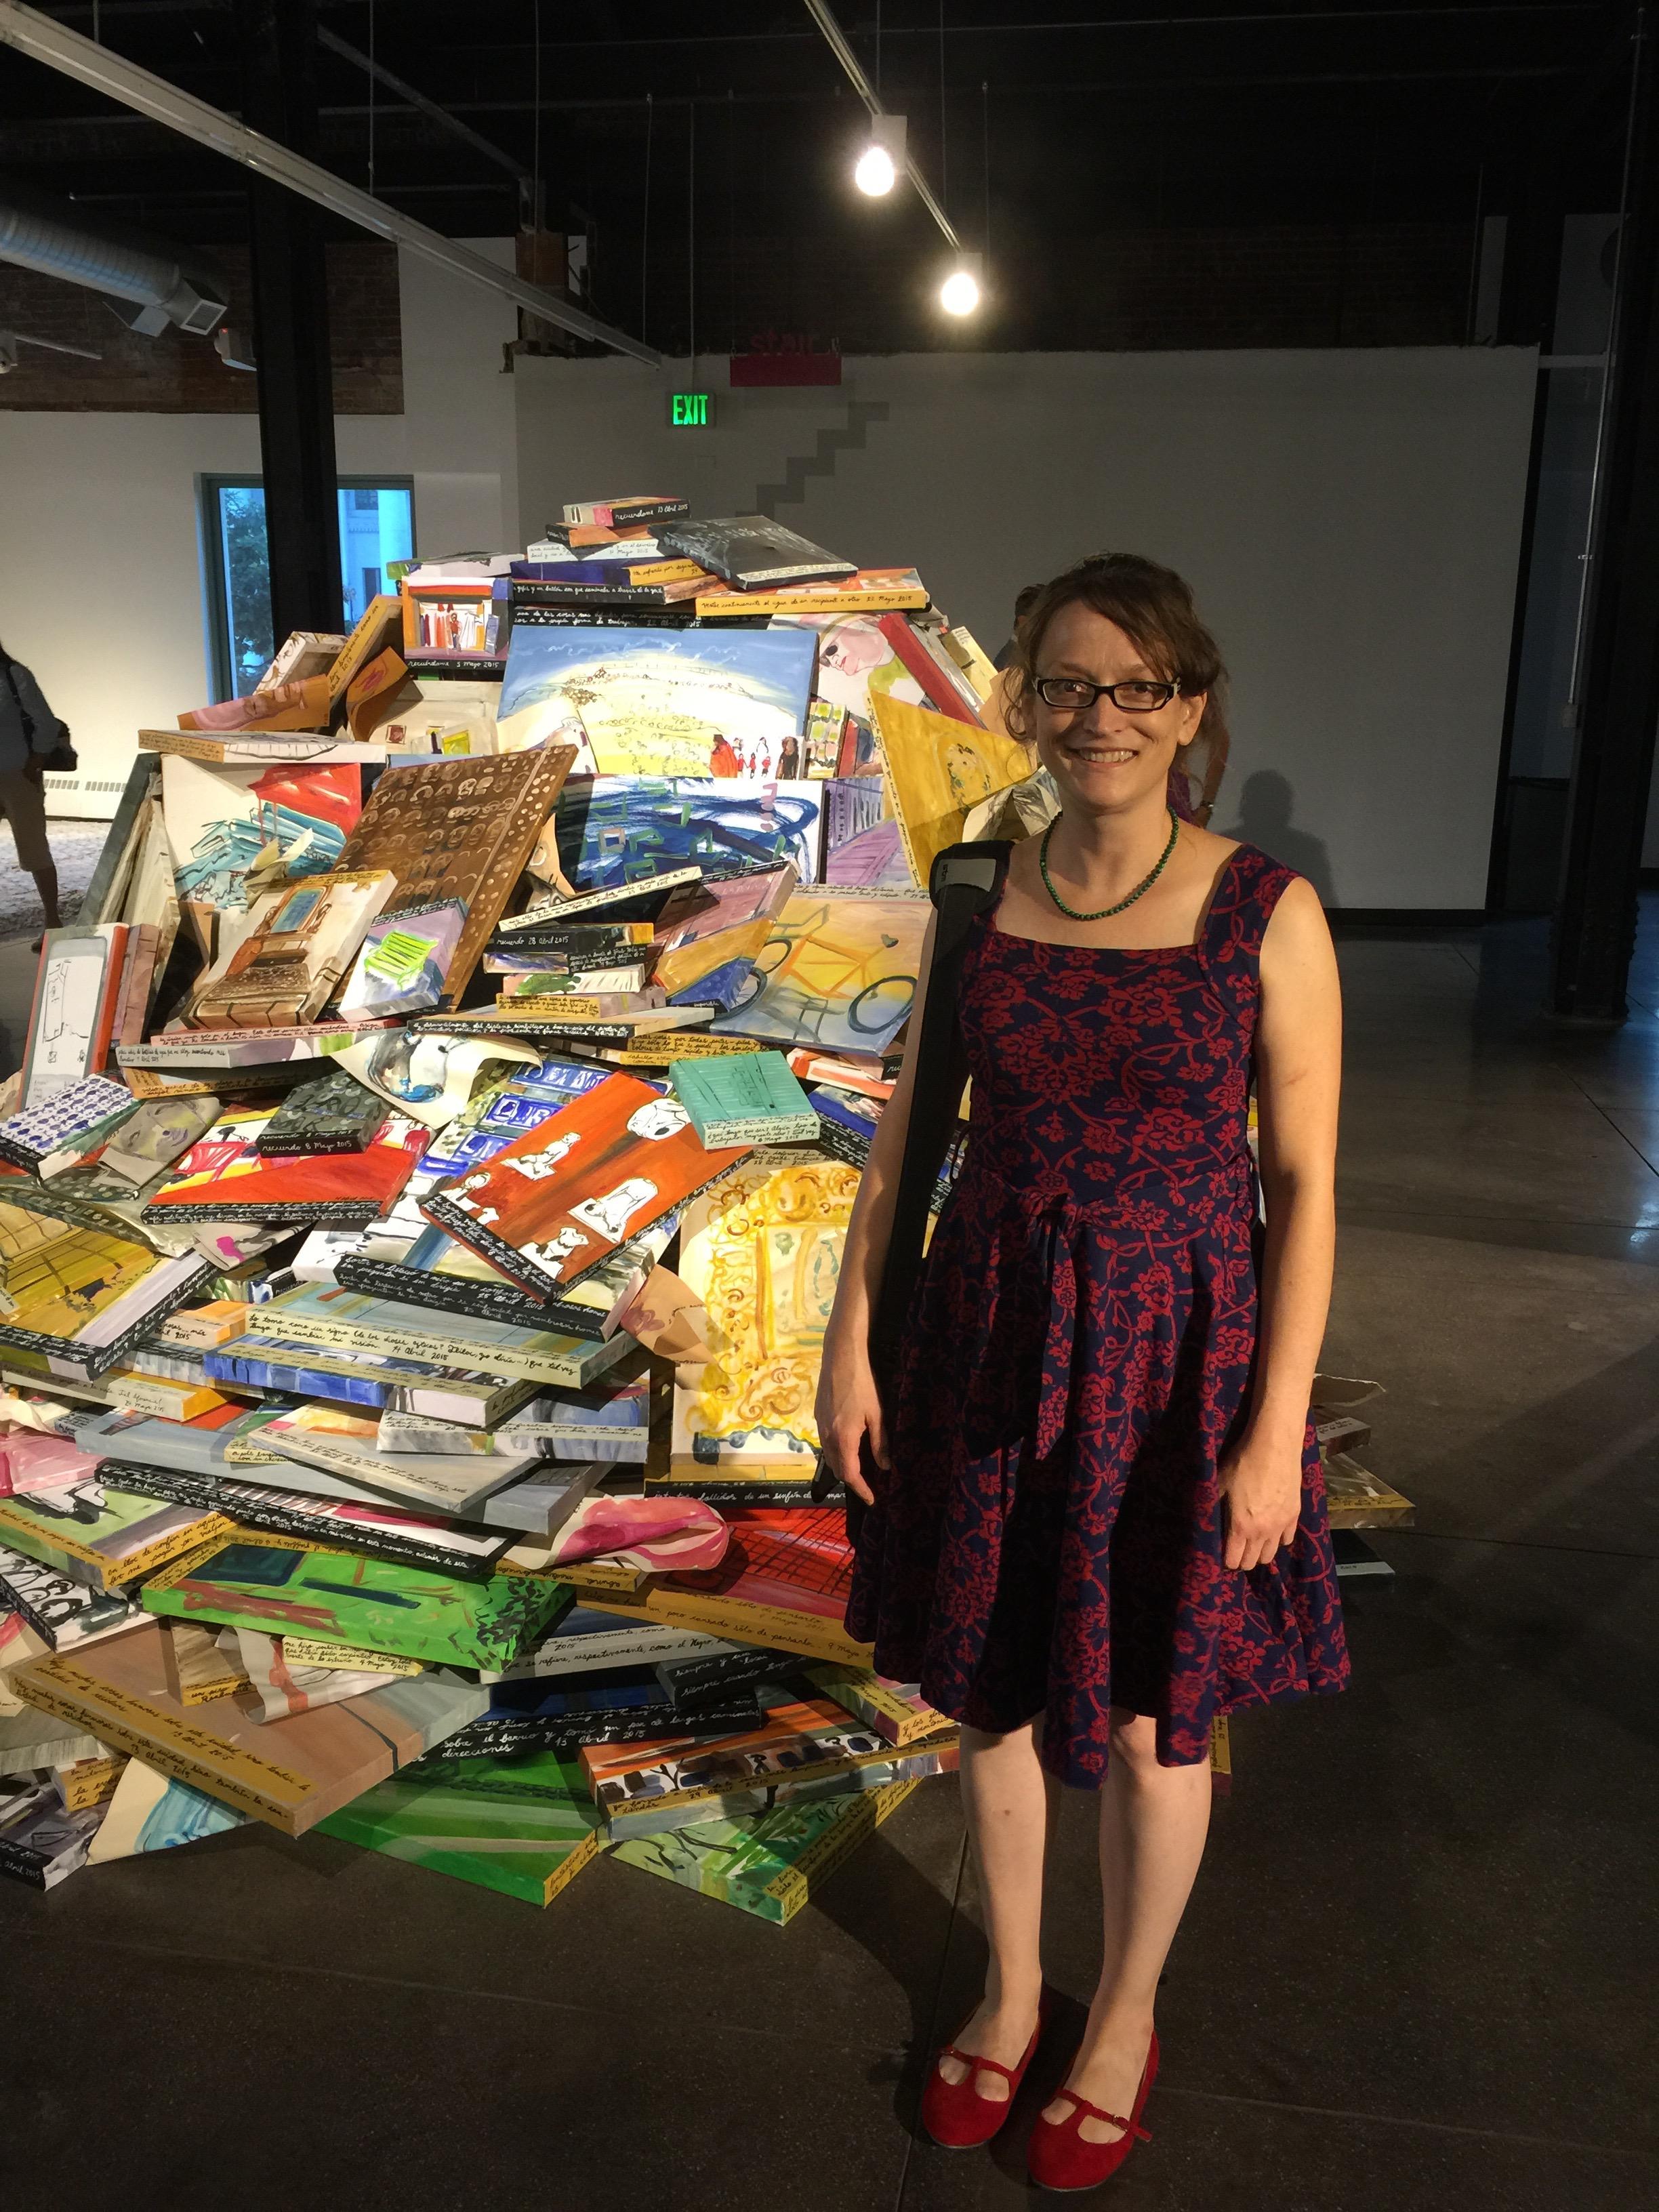 Melissa Furness, Associate Professor, Dept.of Visual Arts, CU Denver College of Arts & Media